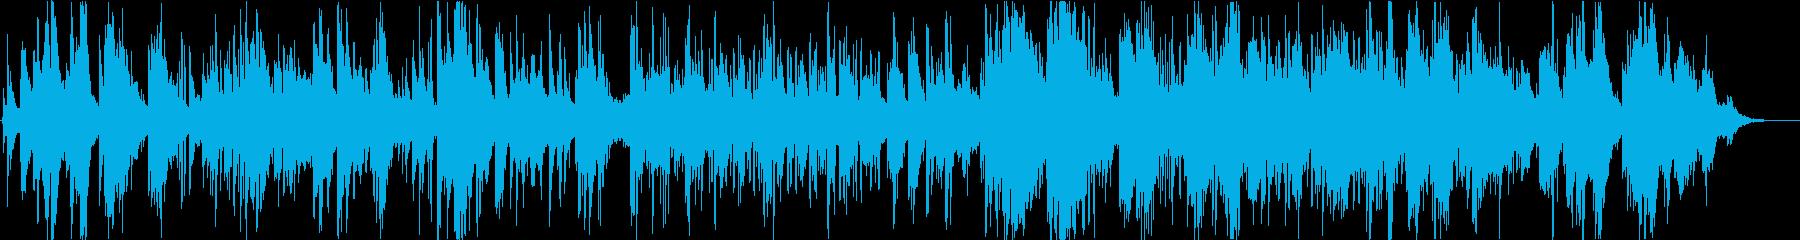 Ethereal、rubato、ピ...の再生済みの波形